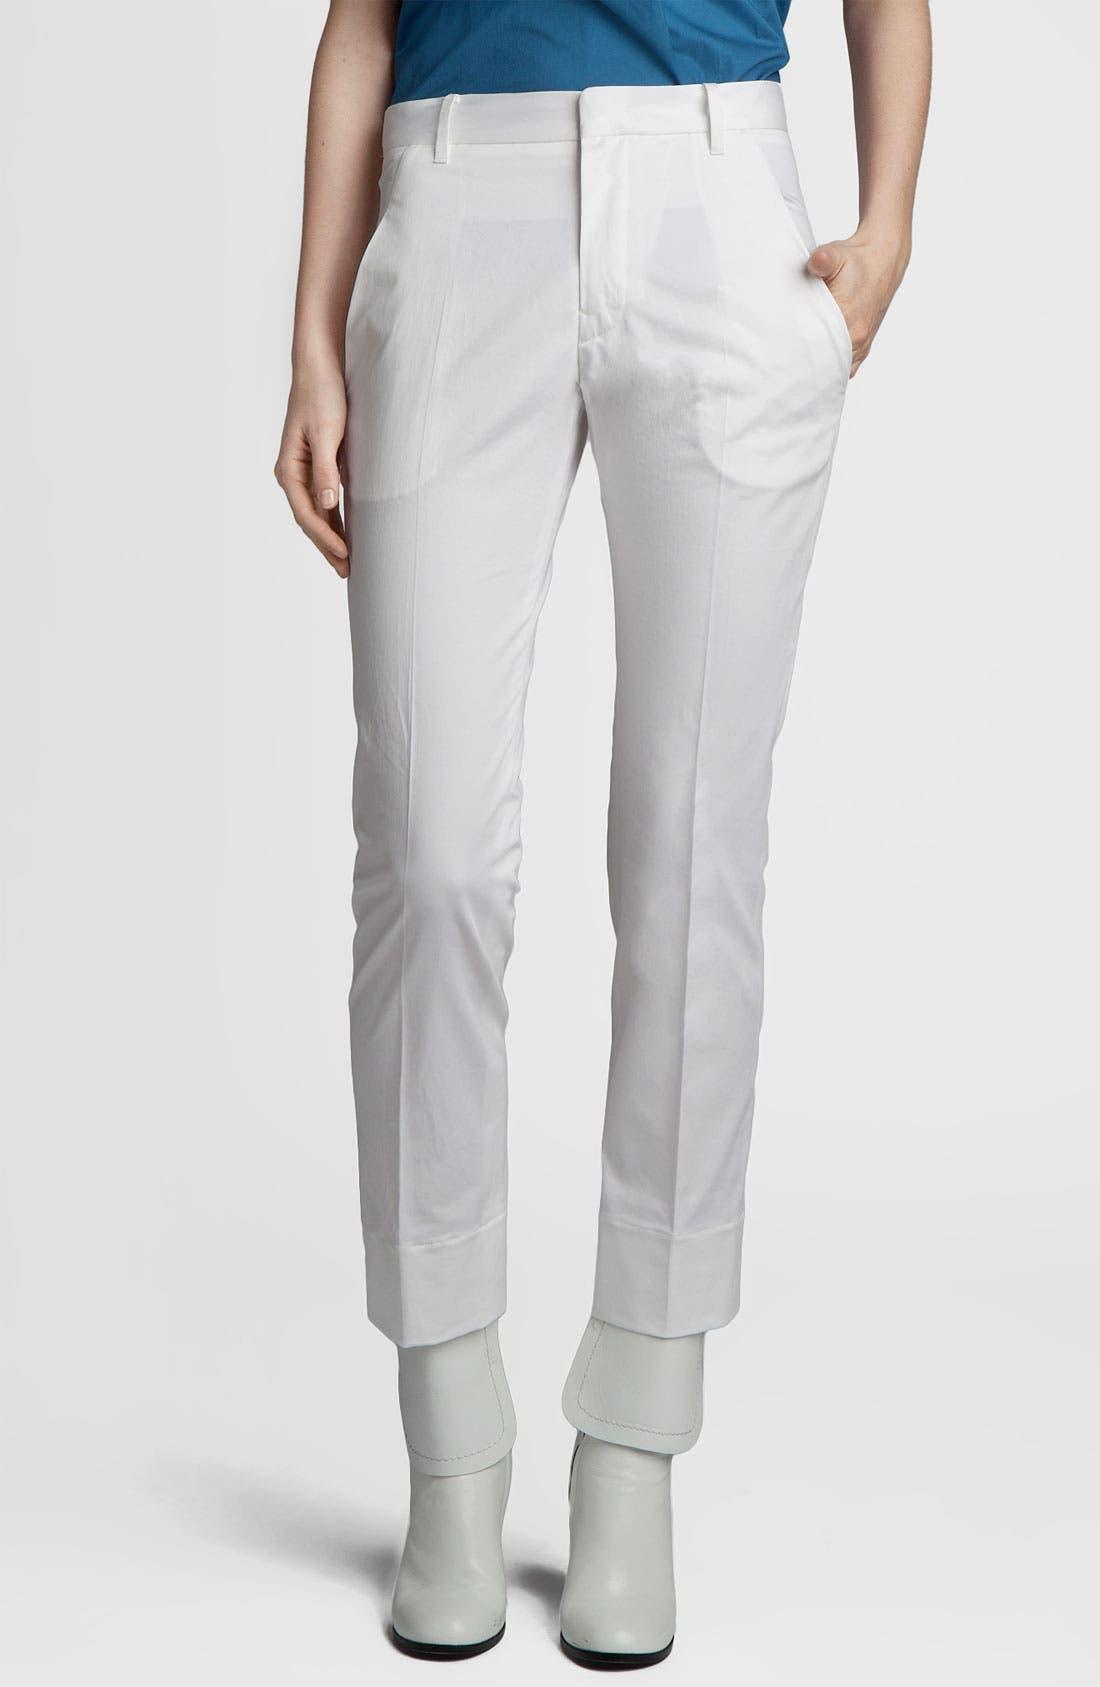 Main Image - Jil Sander 'Niccolo' Slim Stretch Cotton Pants